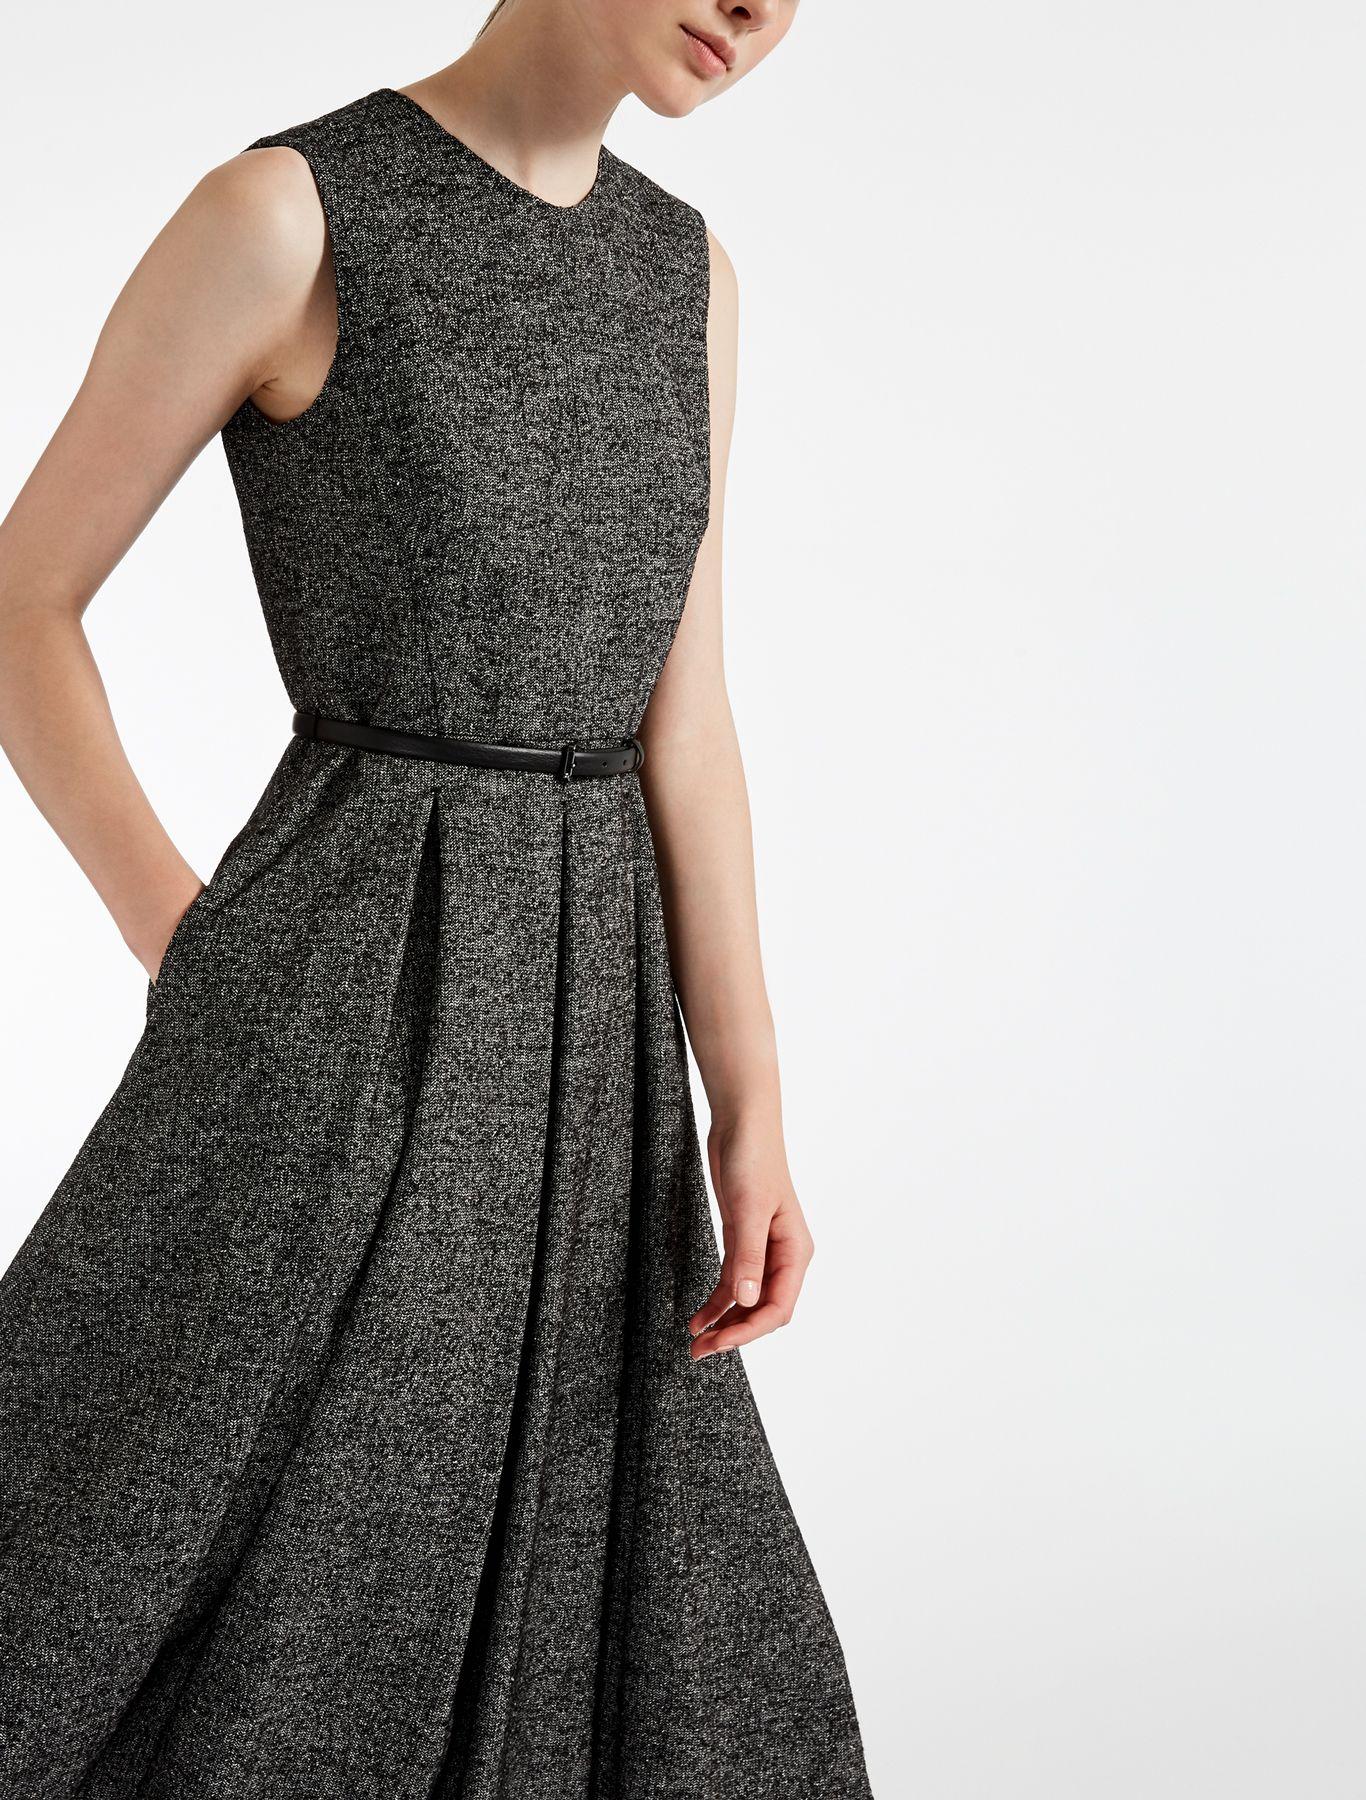 online retailer 8d3f2 366ca Abito in tweed di lana, bianco/nero -